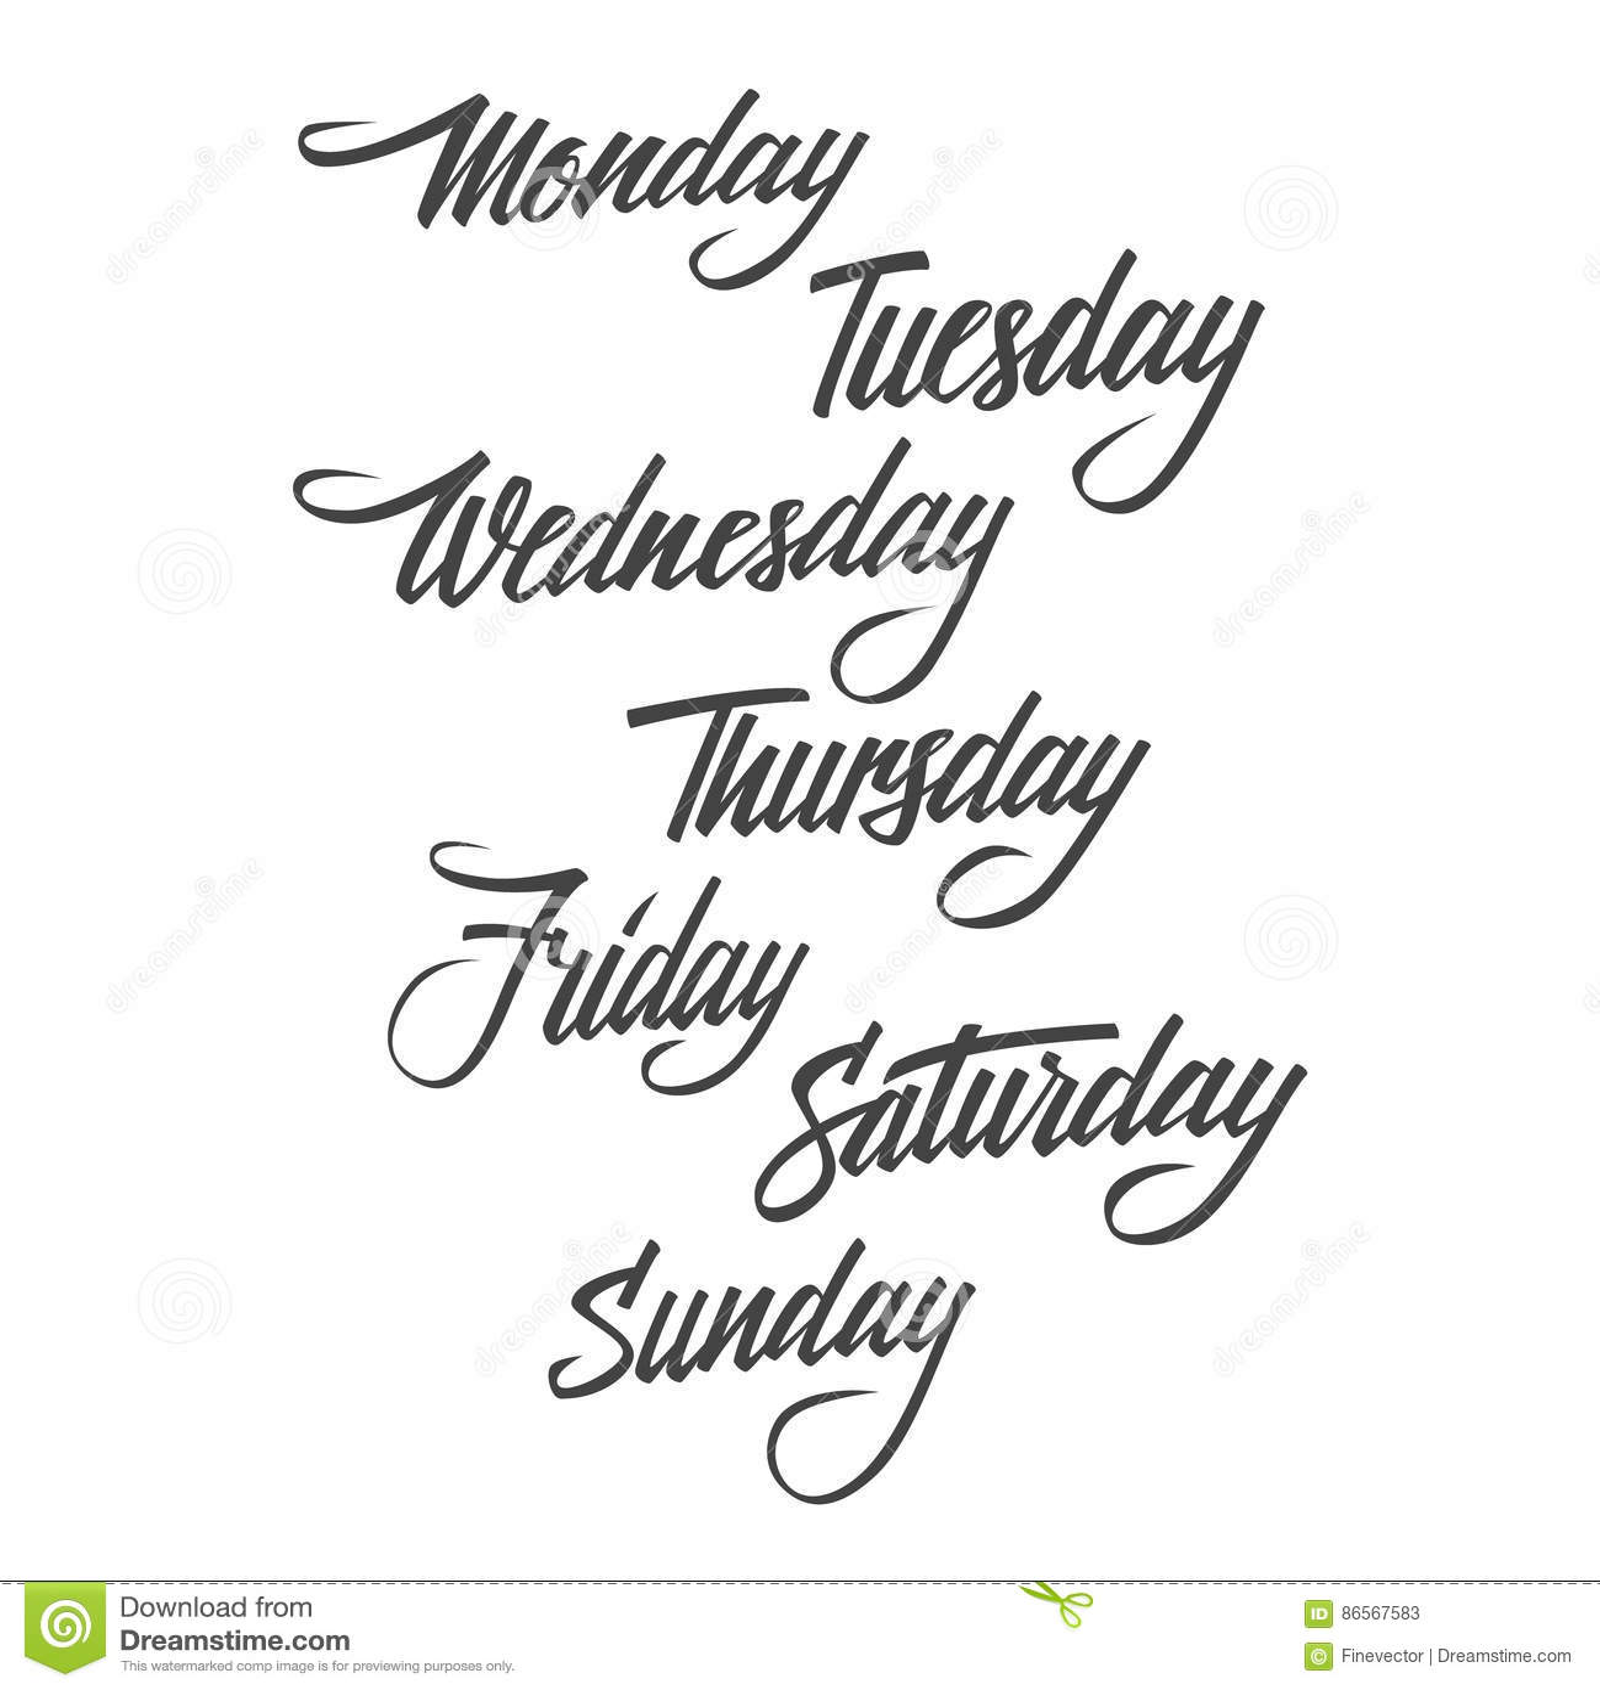 Handwritten Days Of The Week Cartoon Vector